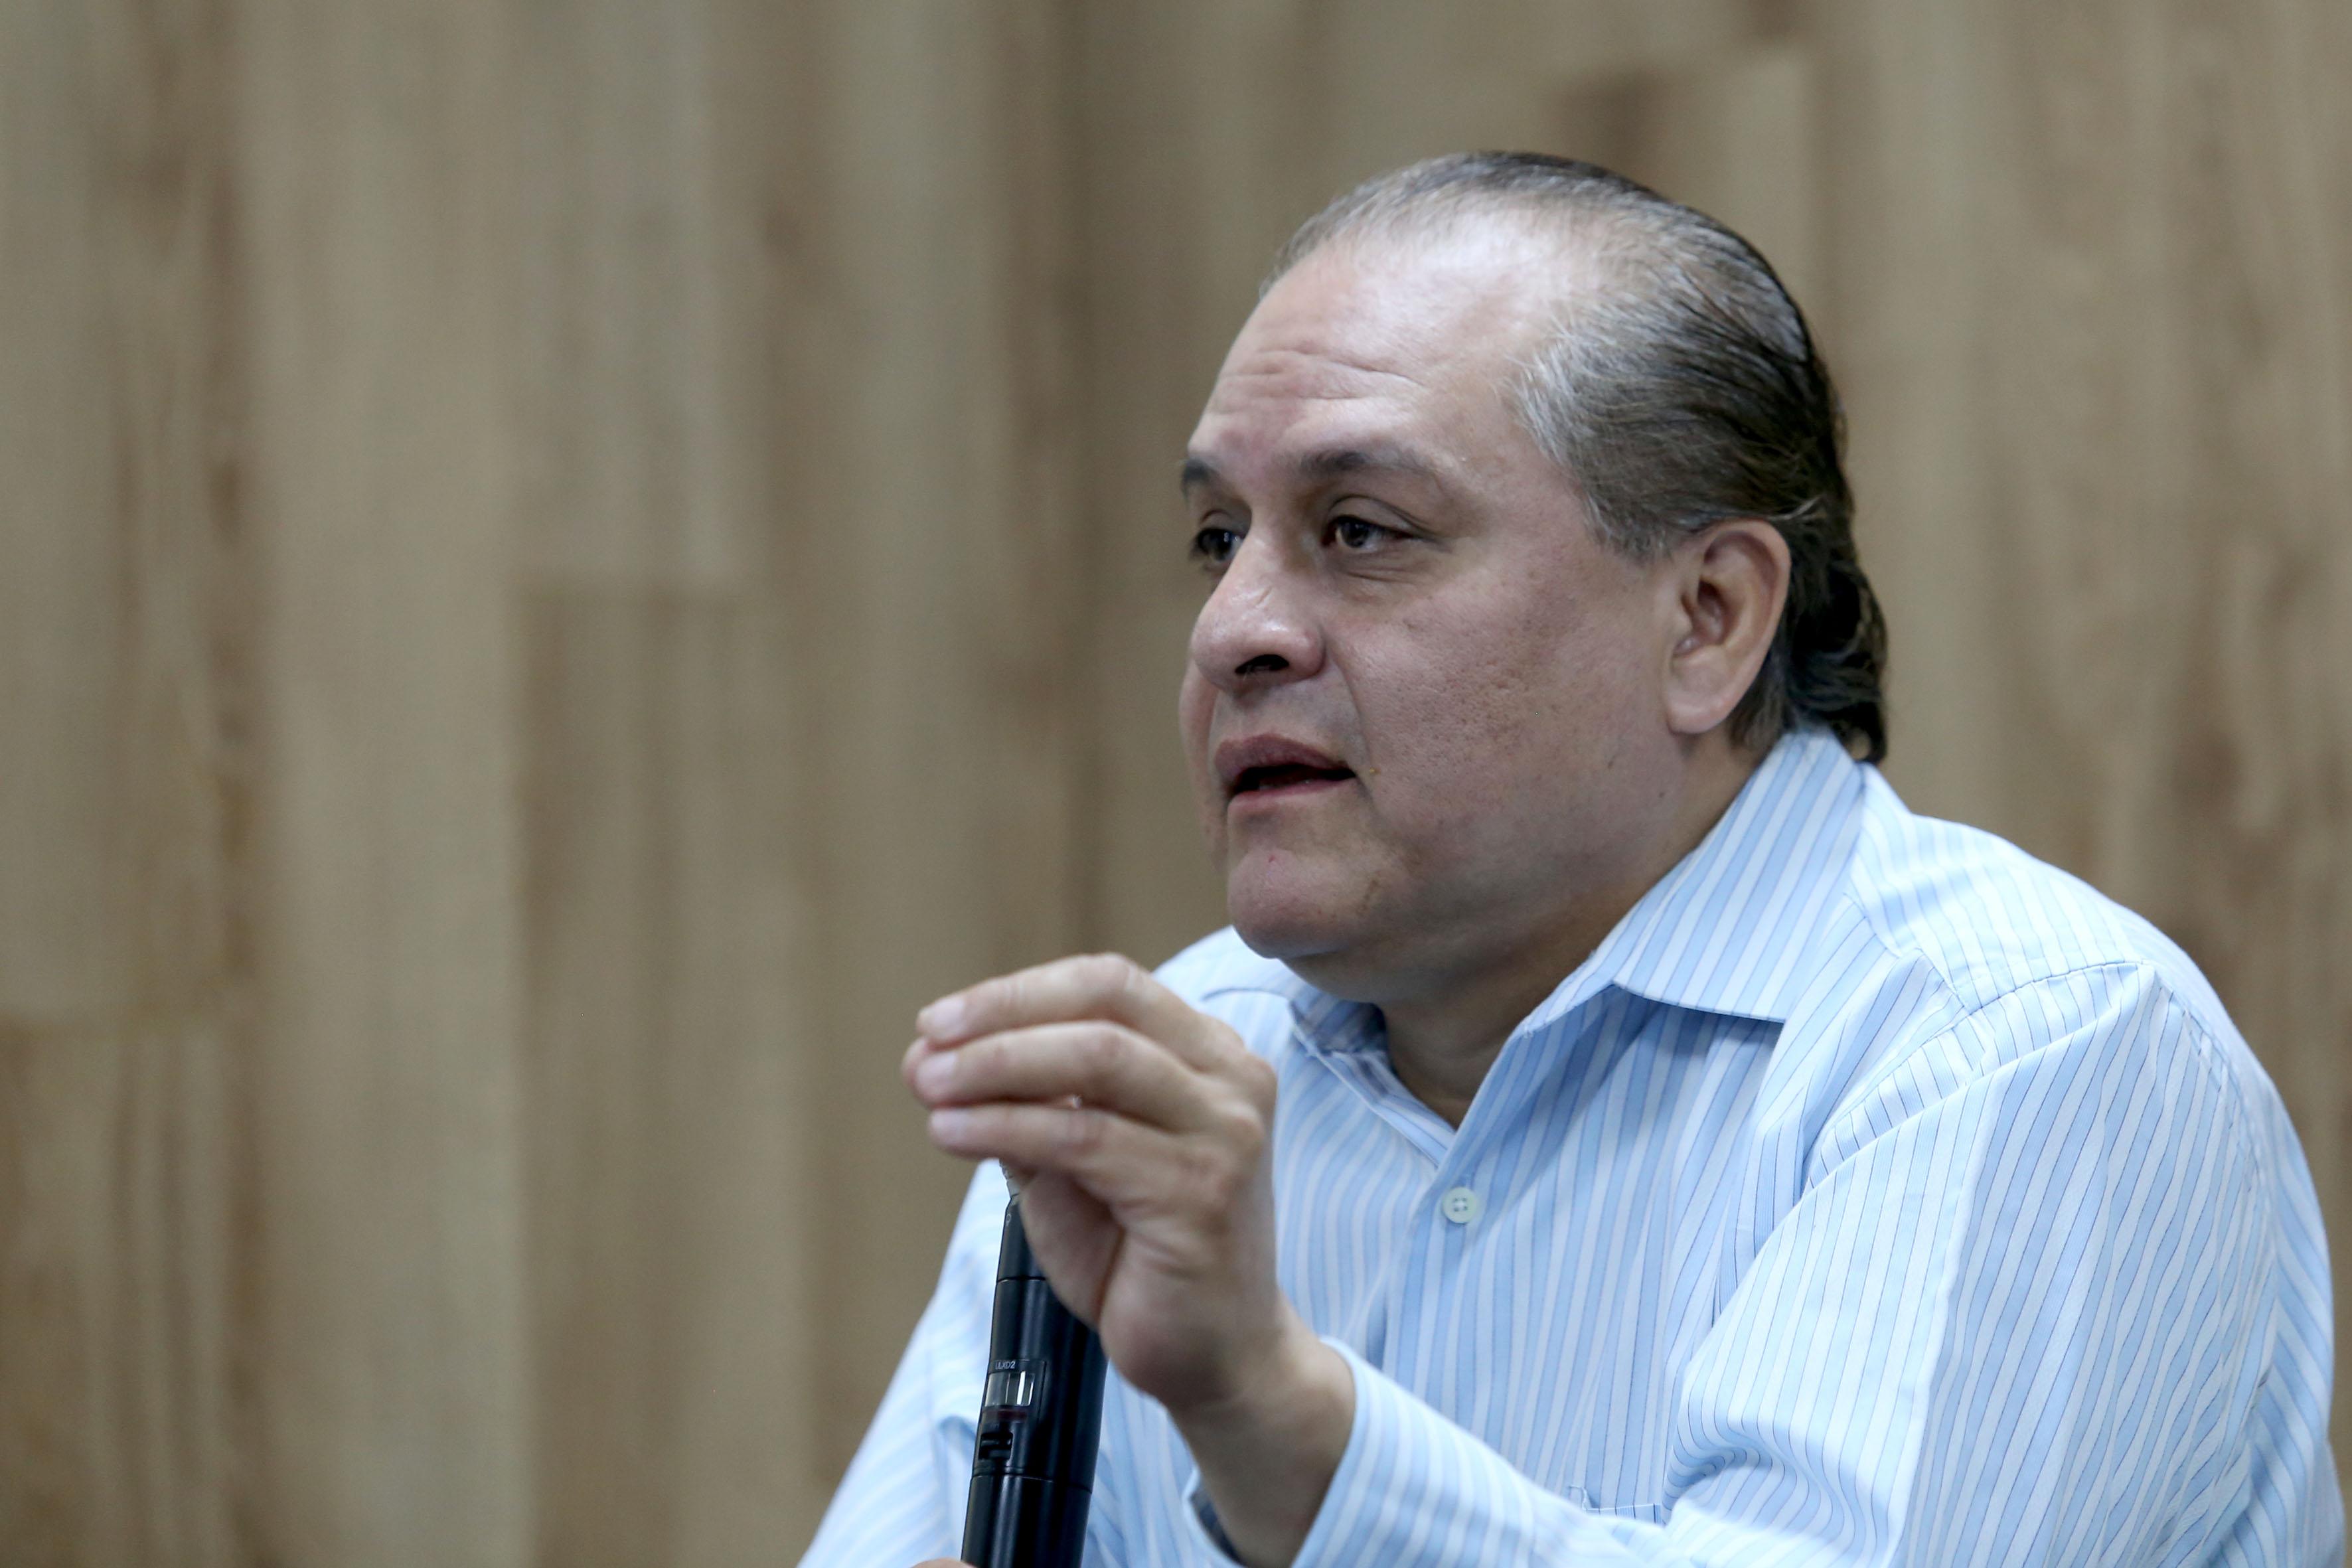 Dr. Hermes Ulises Ramírez al micrófono en rueda de prensa